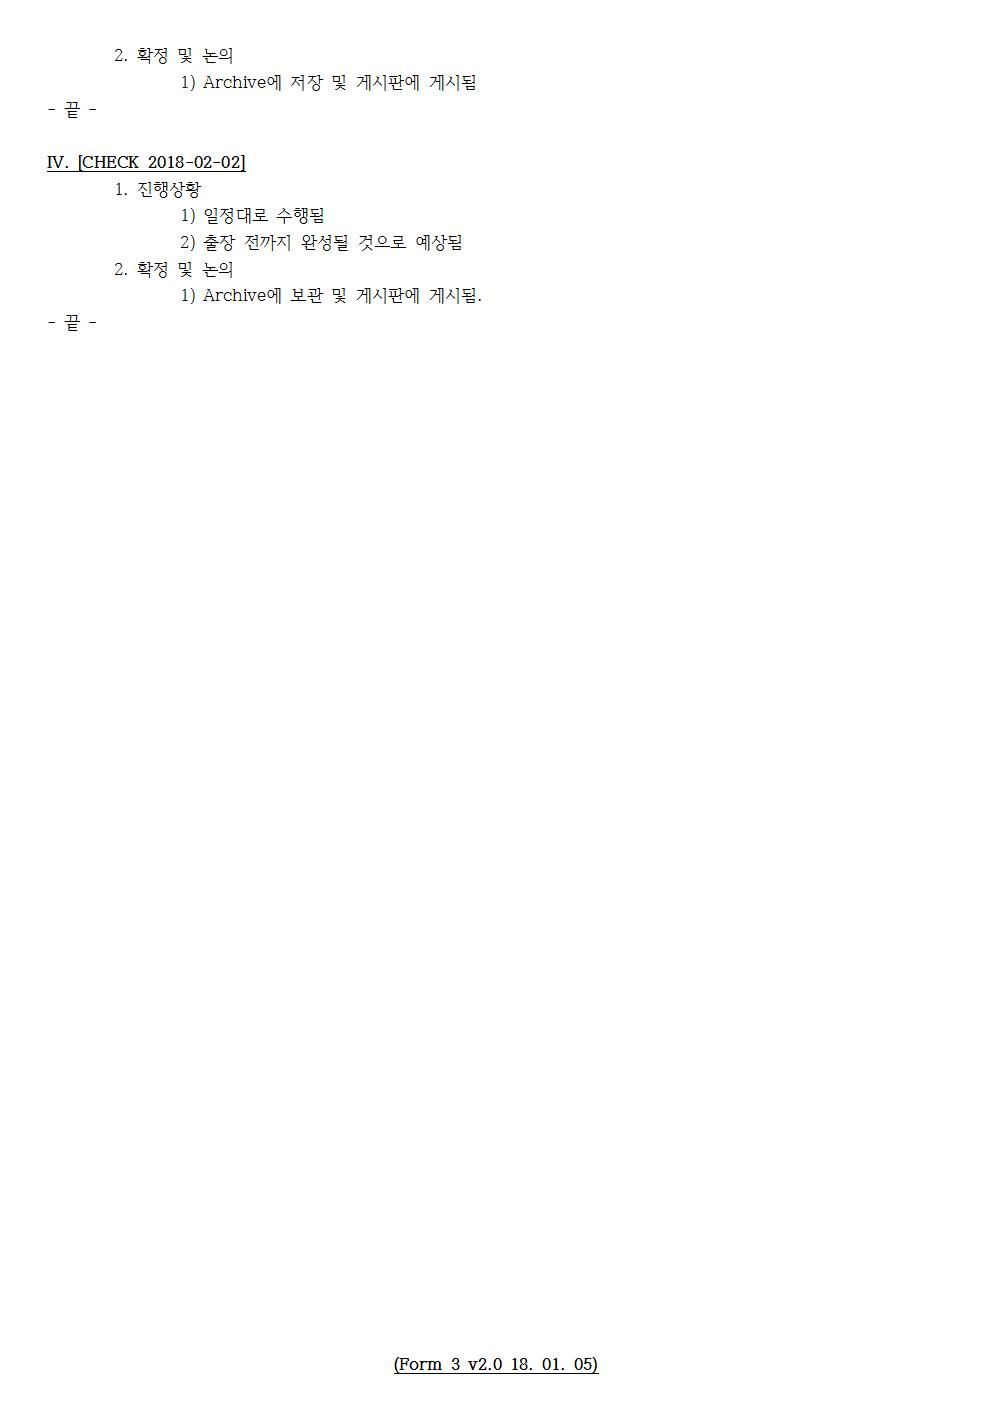 D-[18-001-RD-01]-[SAVE 3.0]-[2018-02-02][SH]002.jpg